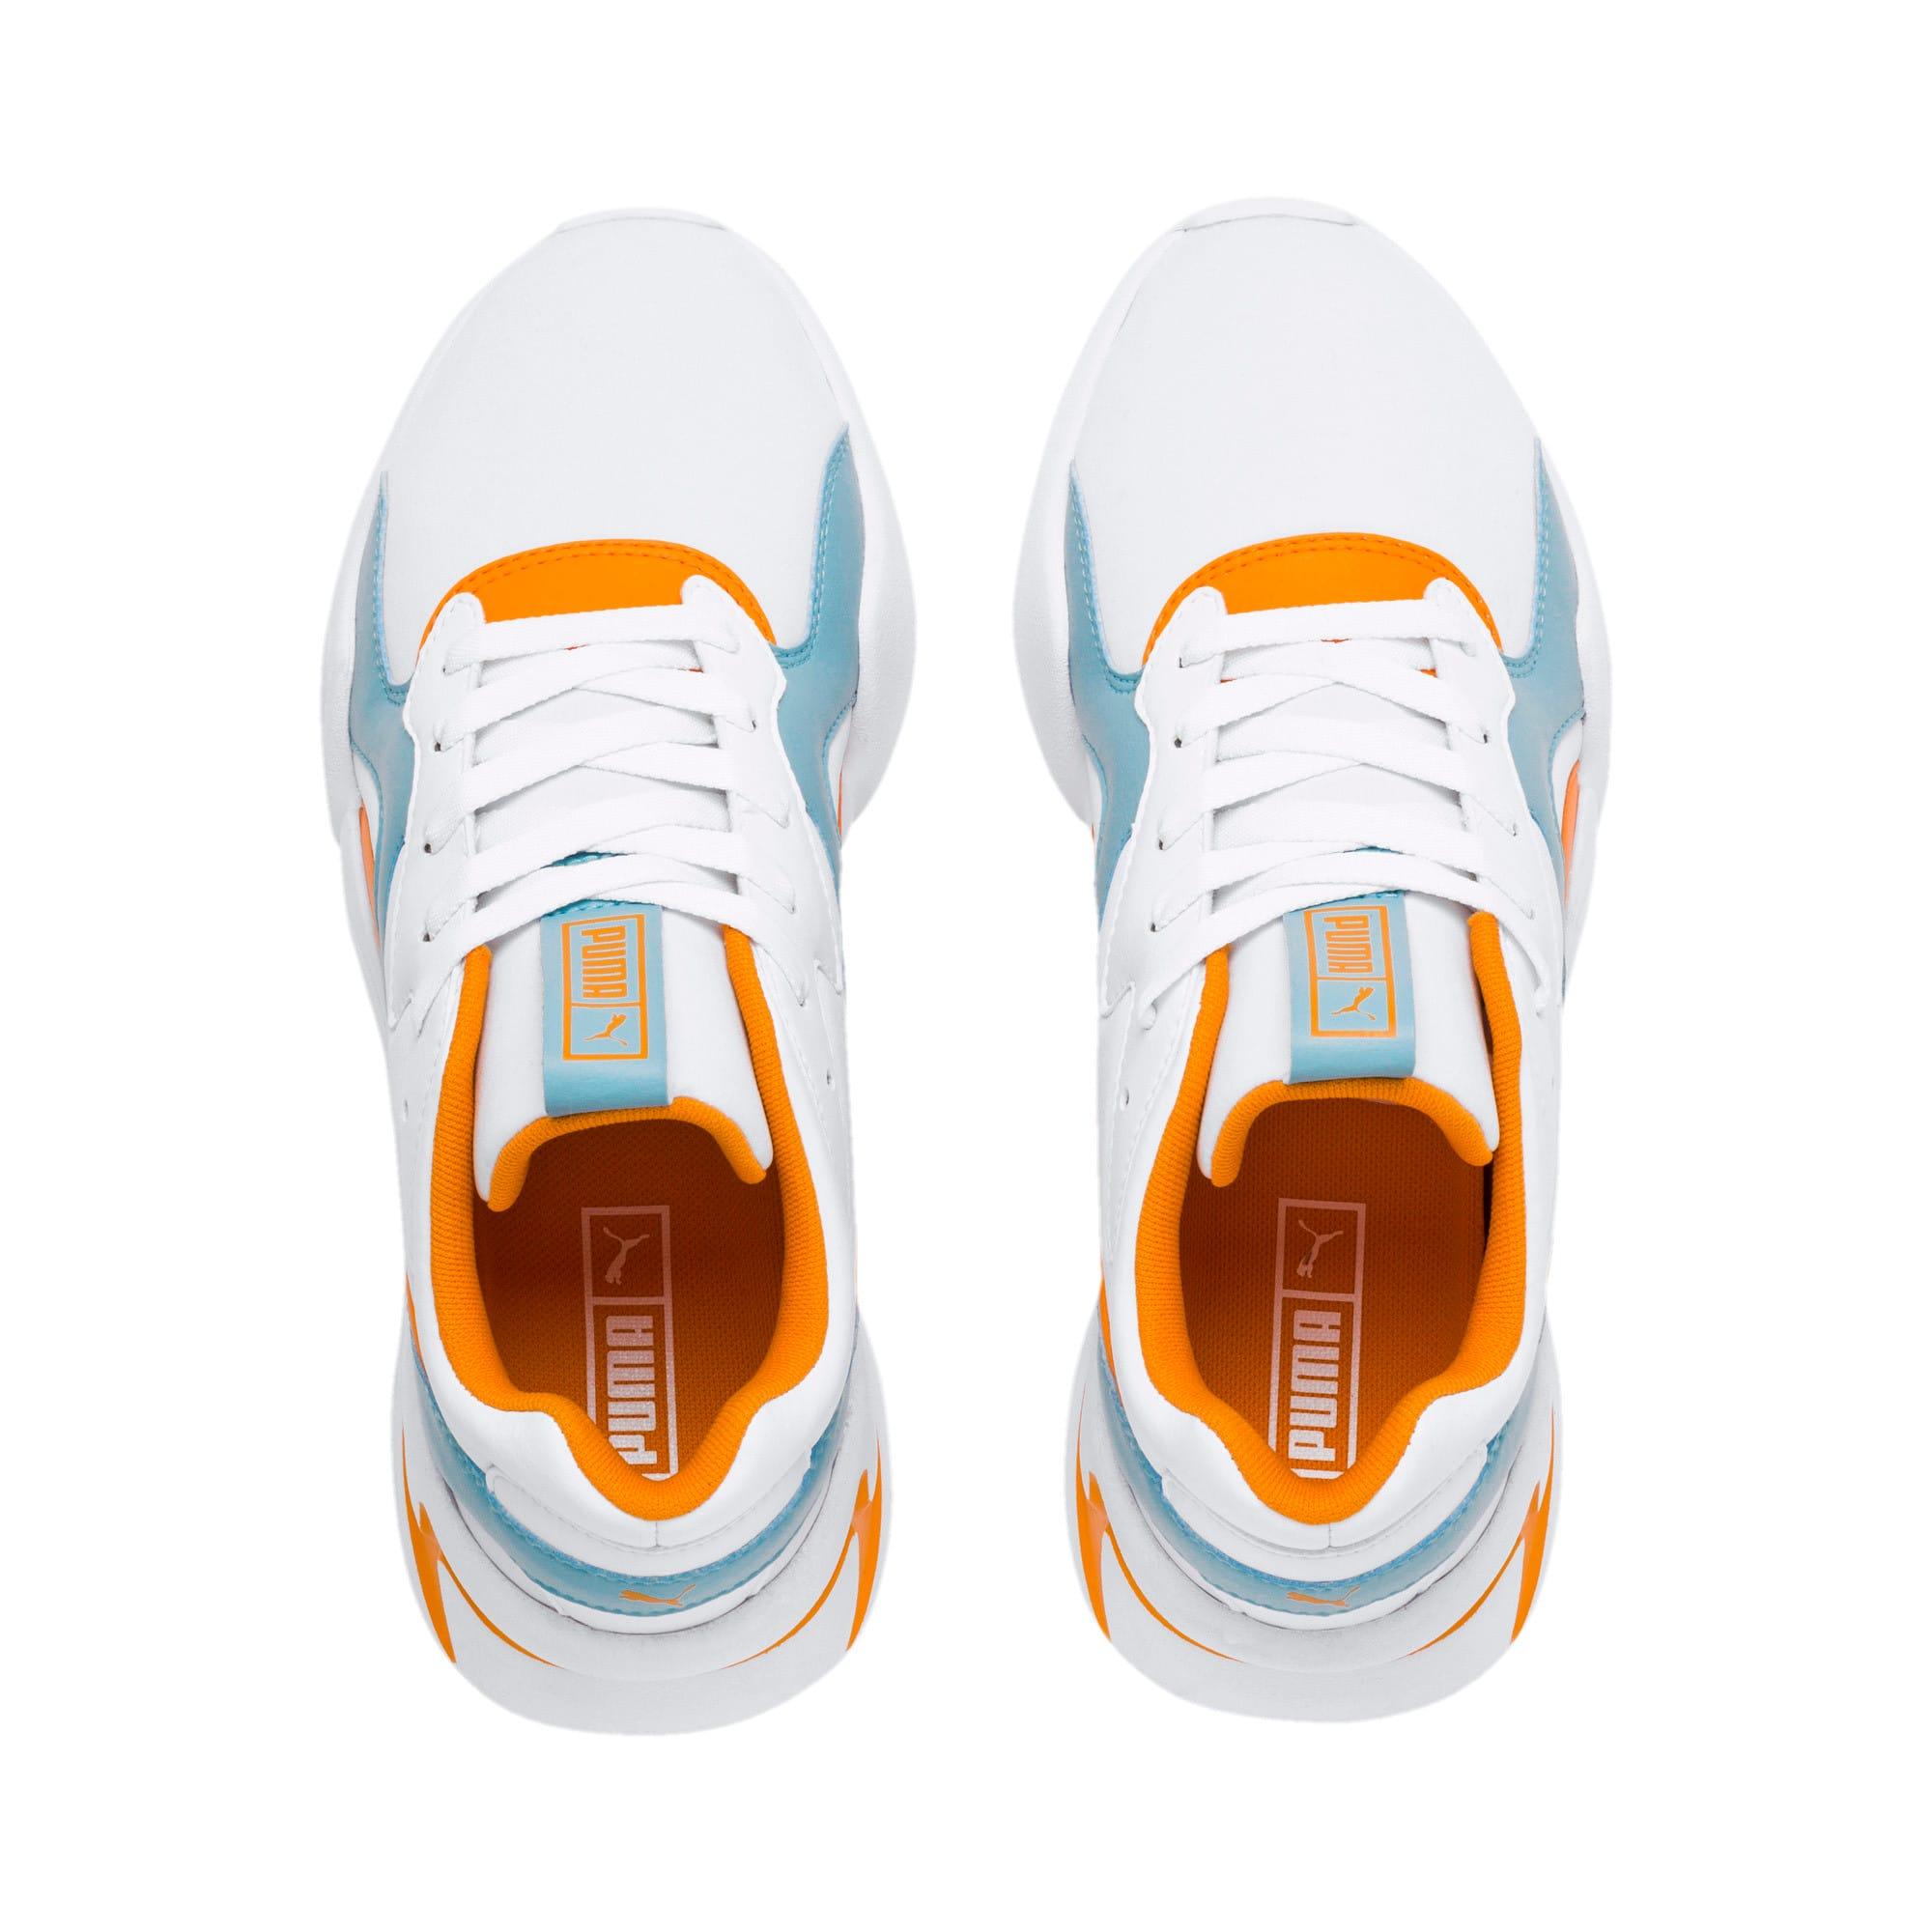 Thumbnail 9 of Nova Women's Sneakers, Puma White-Milky Blue, medium